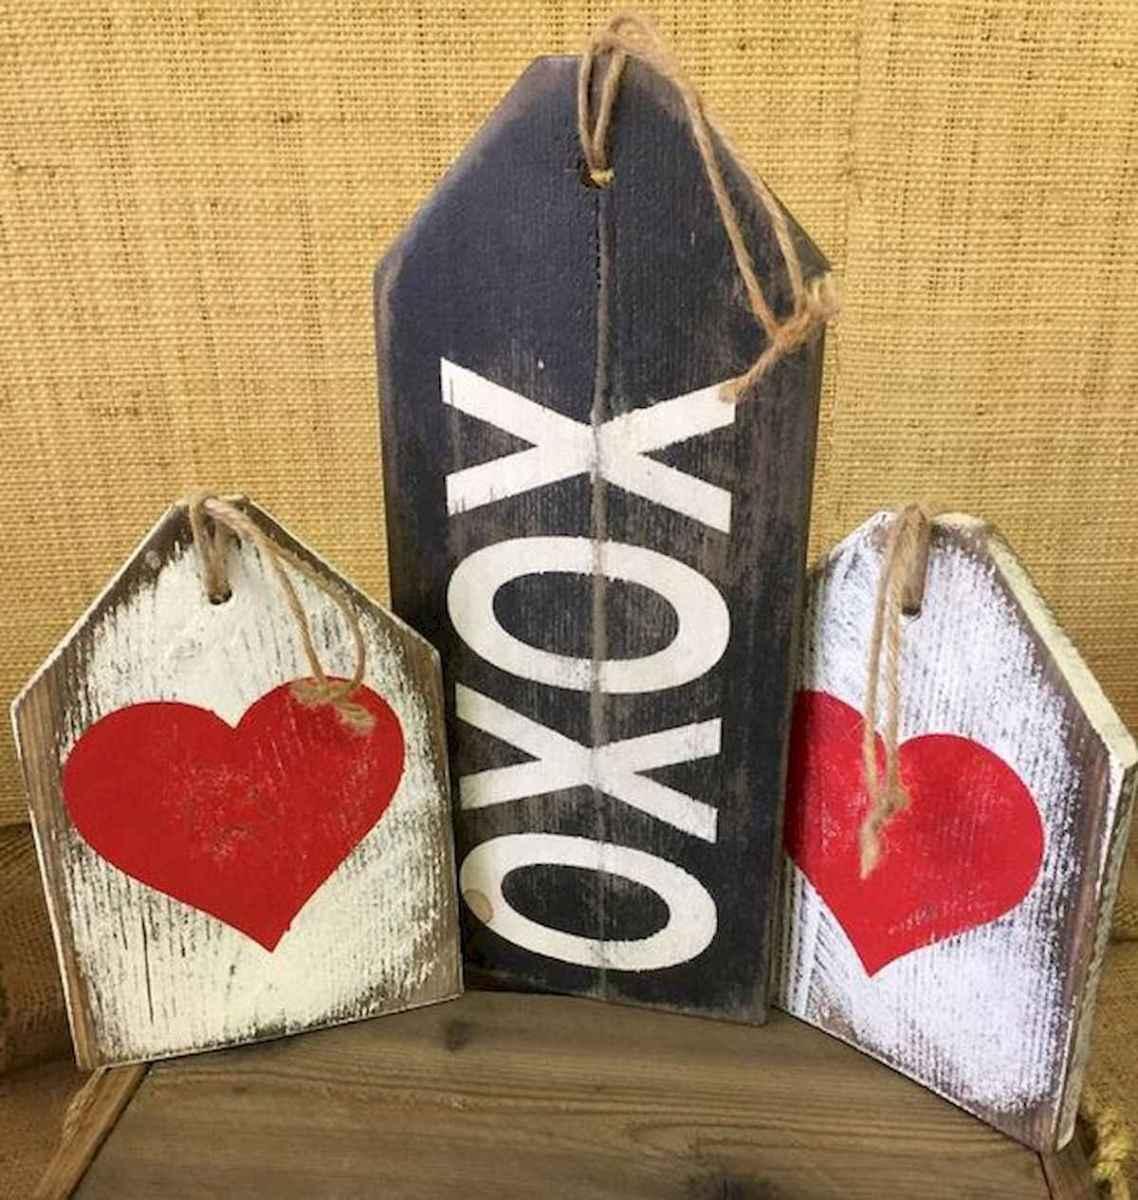 75 lovely valentines day crafts design ideas (1)